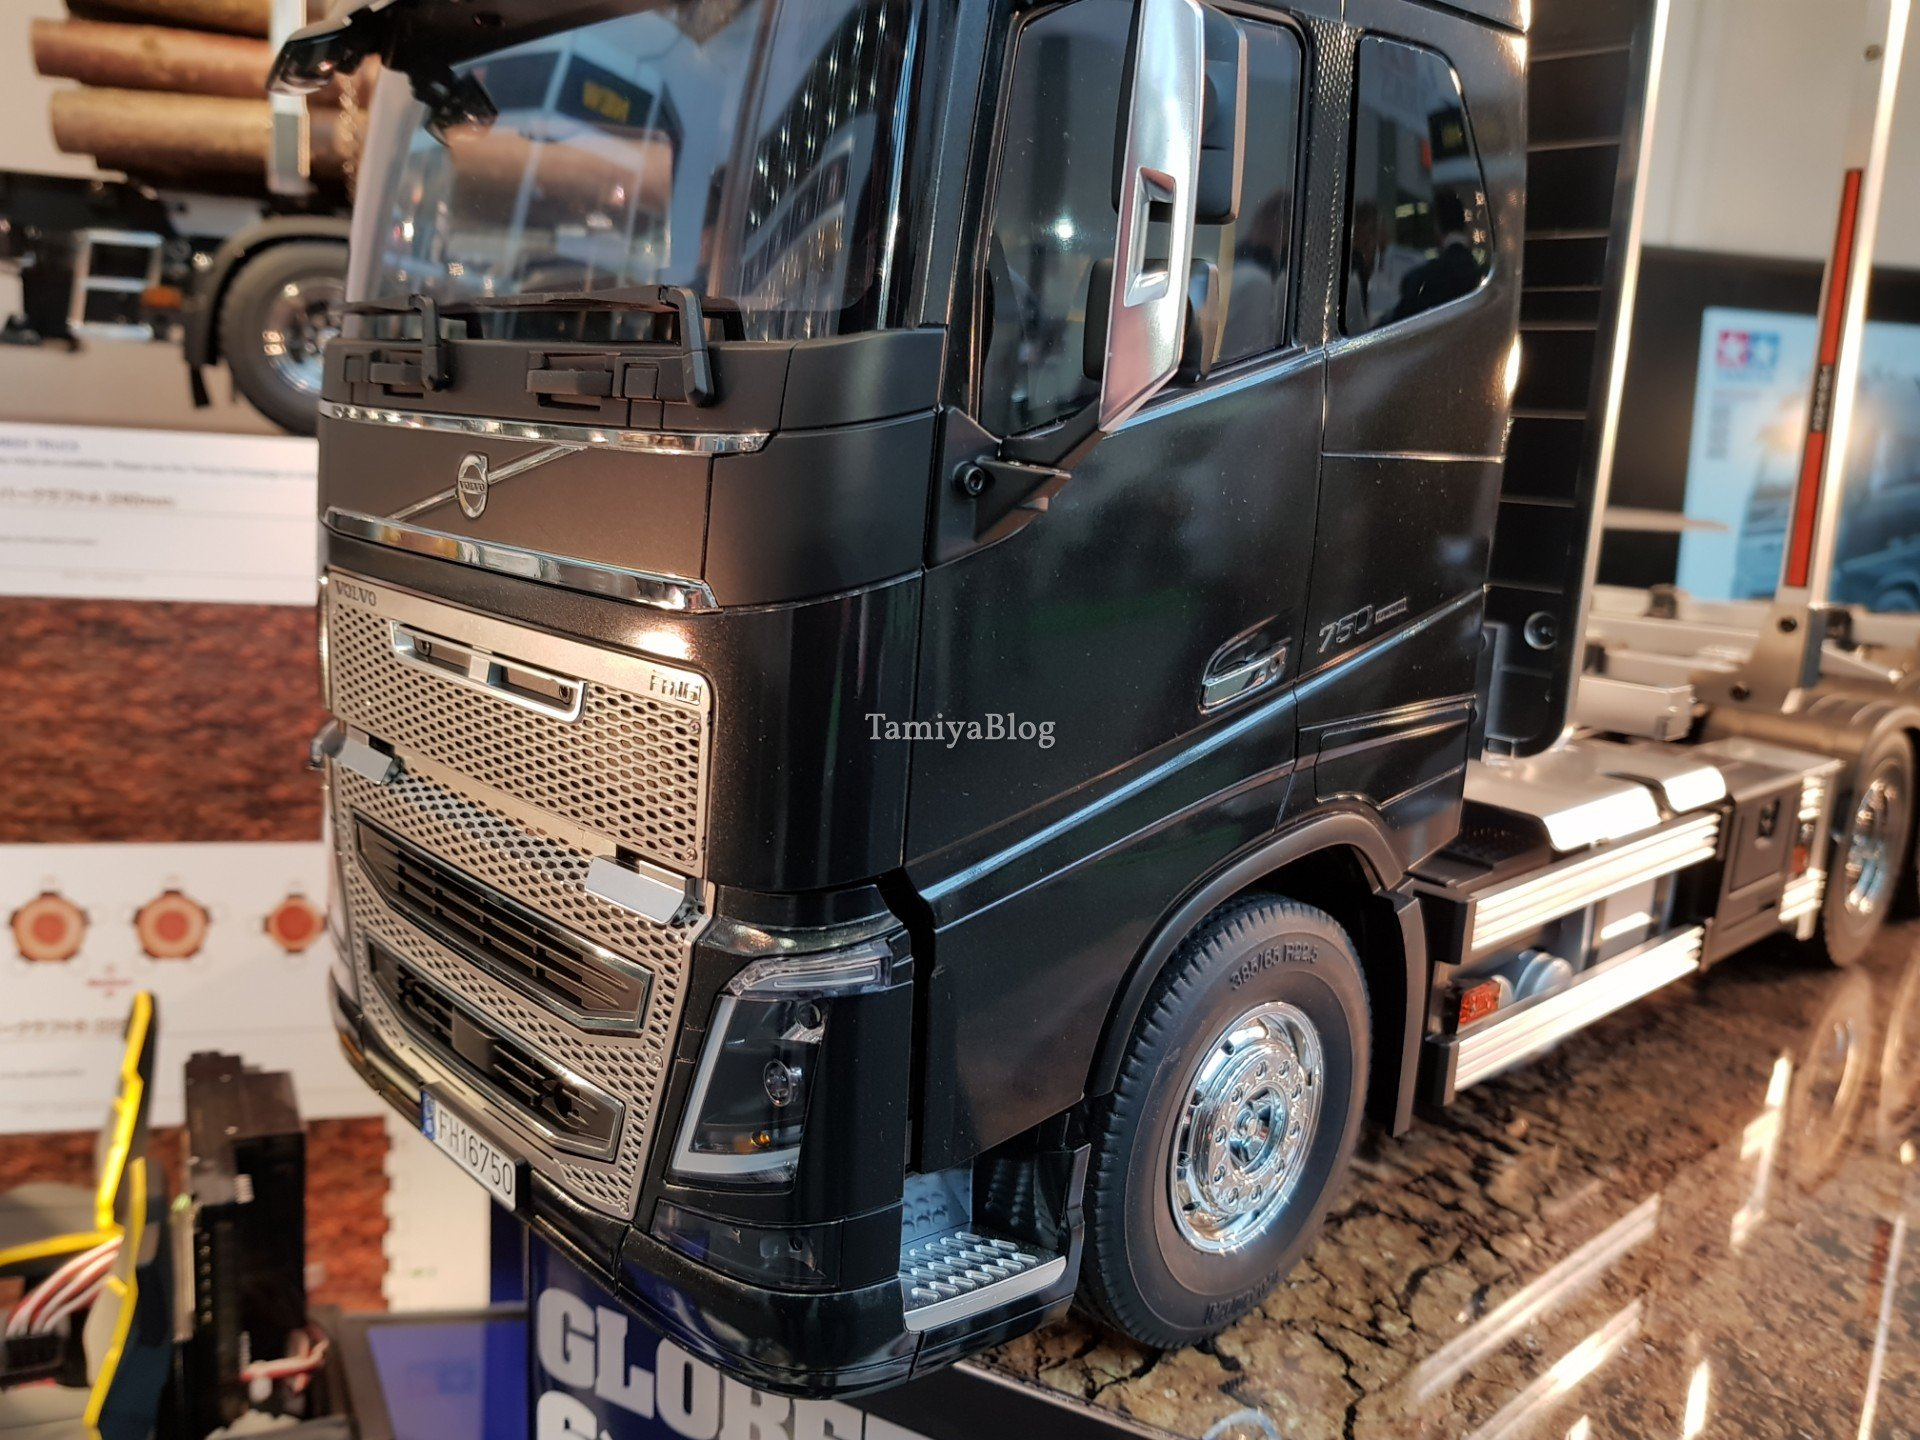 Nuevo camion de TAMIYA Volvo FH16 Globetrotter 750 6x4 Timber 20190130_100321_tamiyablognuremberg8360730308884998140